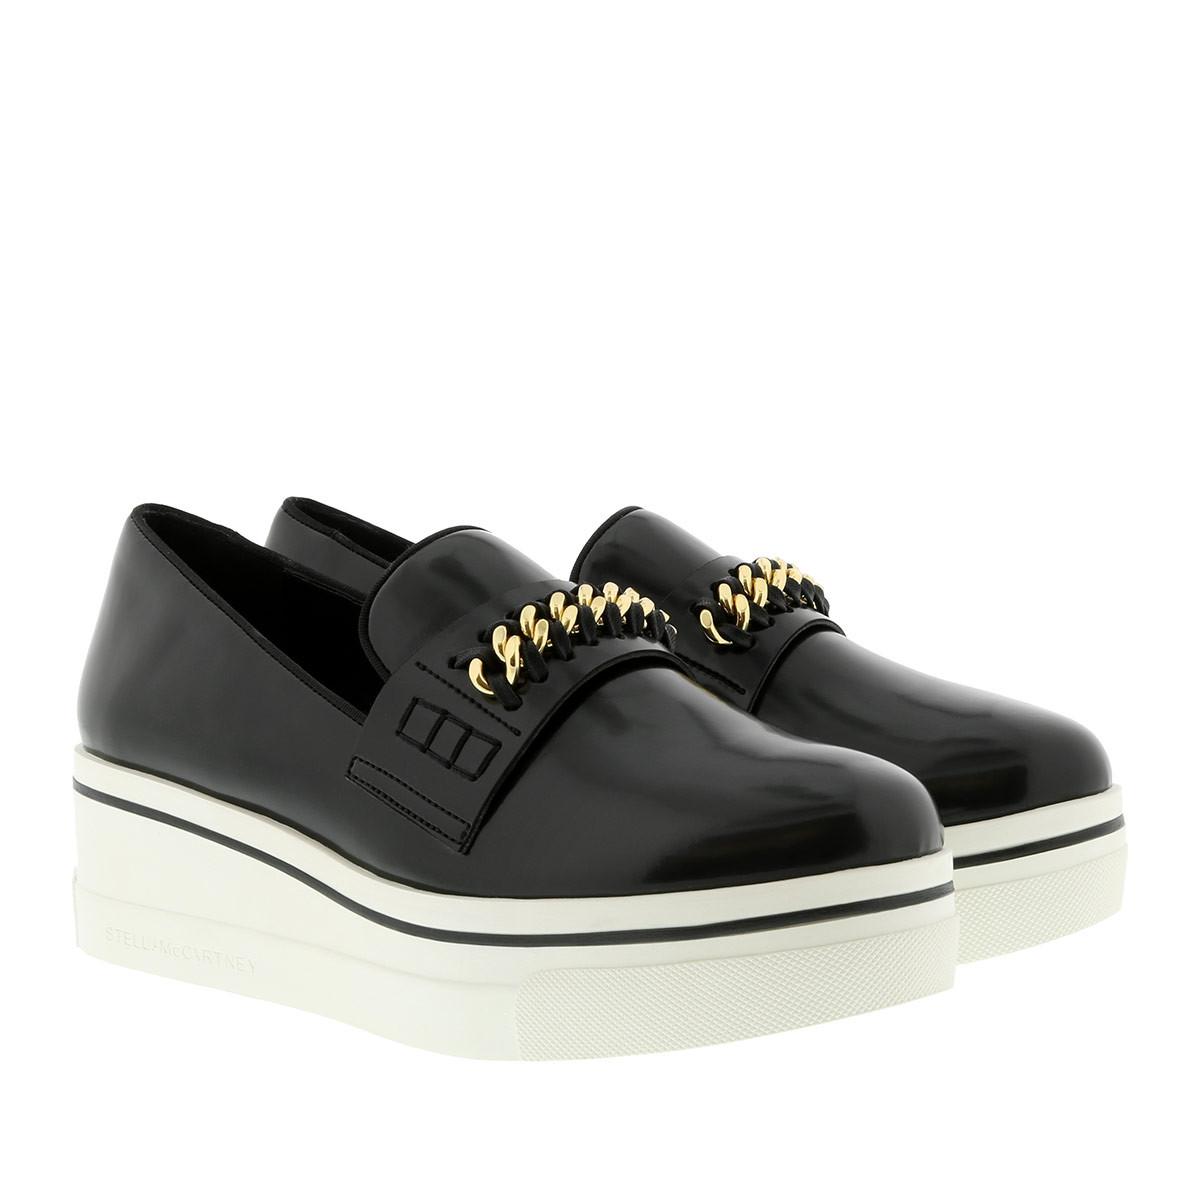 Stella Mc Cartney Loafers & slippers Krijgen Om Online Te Kopen Footlocker Foto's Online Te Koop Klaring Kortingen Goedkope Koop Finish BbQUuUx2I9